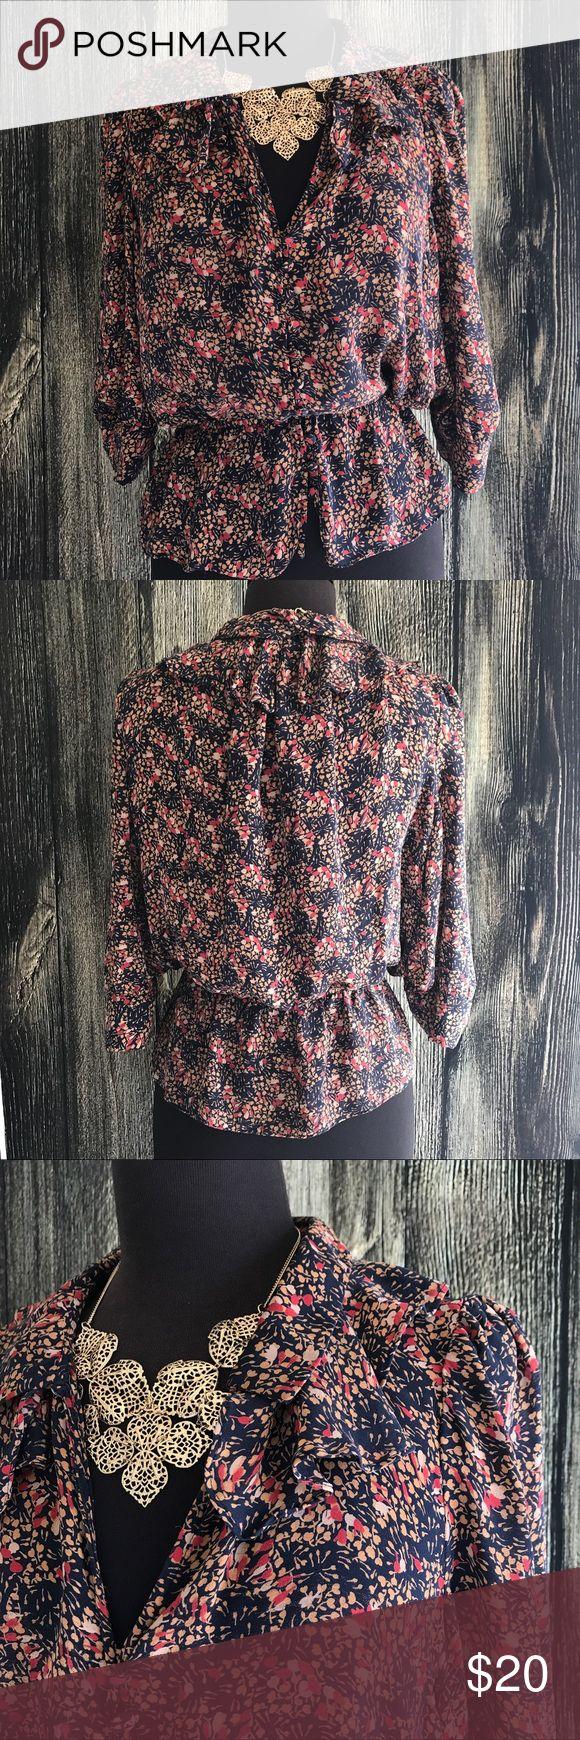 25 Best Ruffle Shirt Ideas On Pinterest Affordable